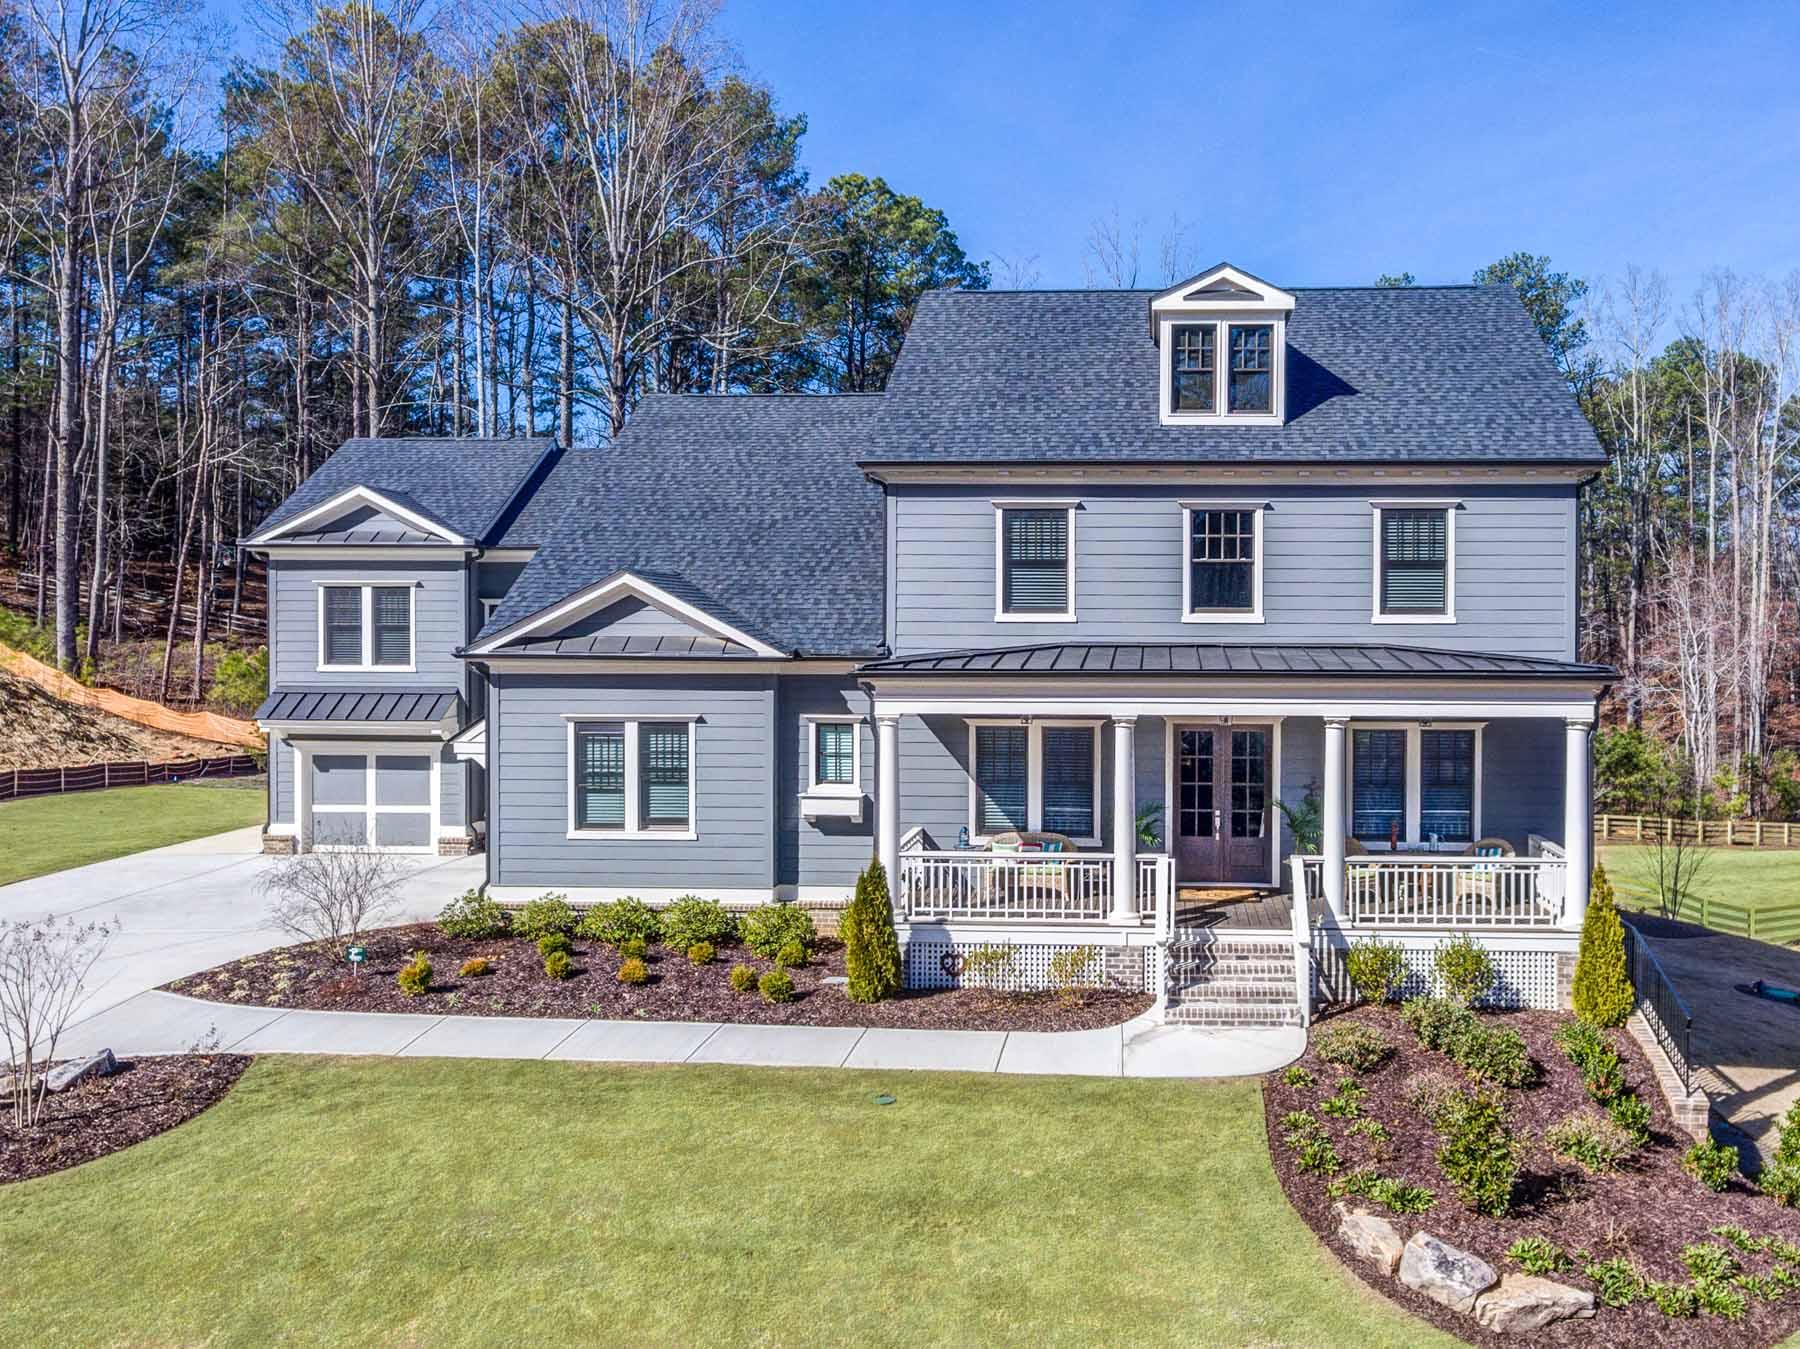 Single Family Home for Sale at Breathtaking Ashton Woods Home 2015 Coppice Court Milton, Georgia, 30004 United States